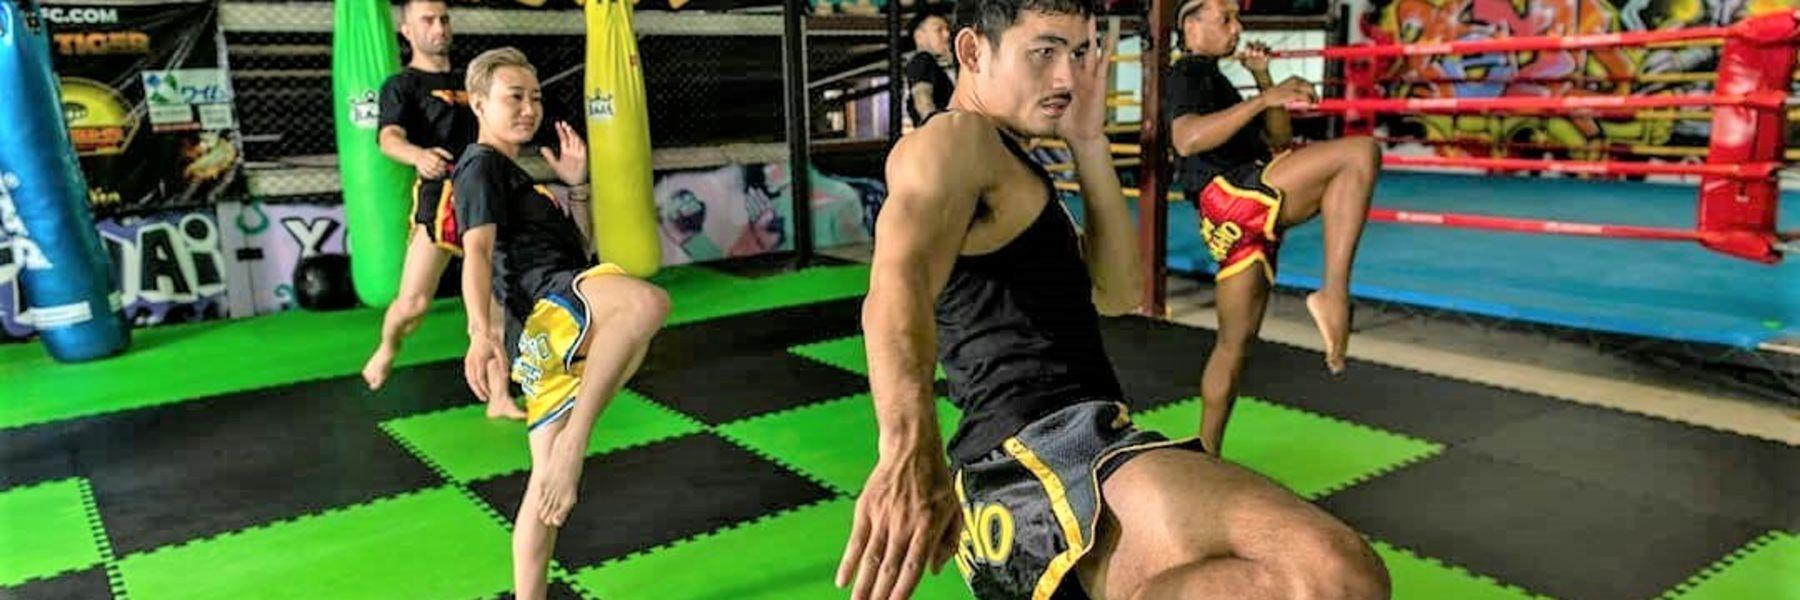 Thai-Yo Academy image